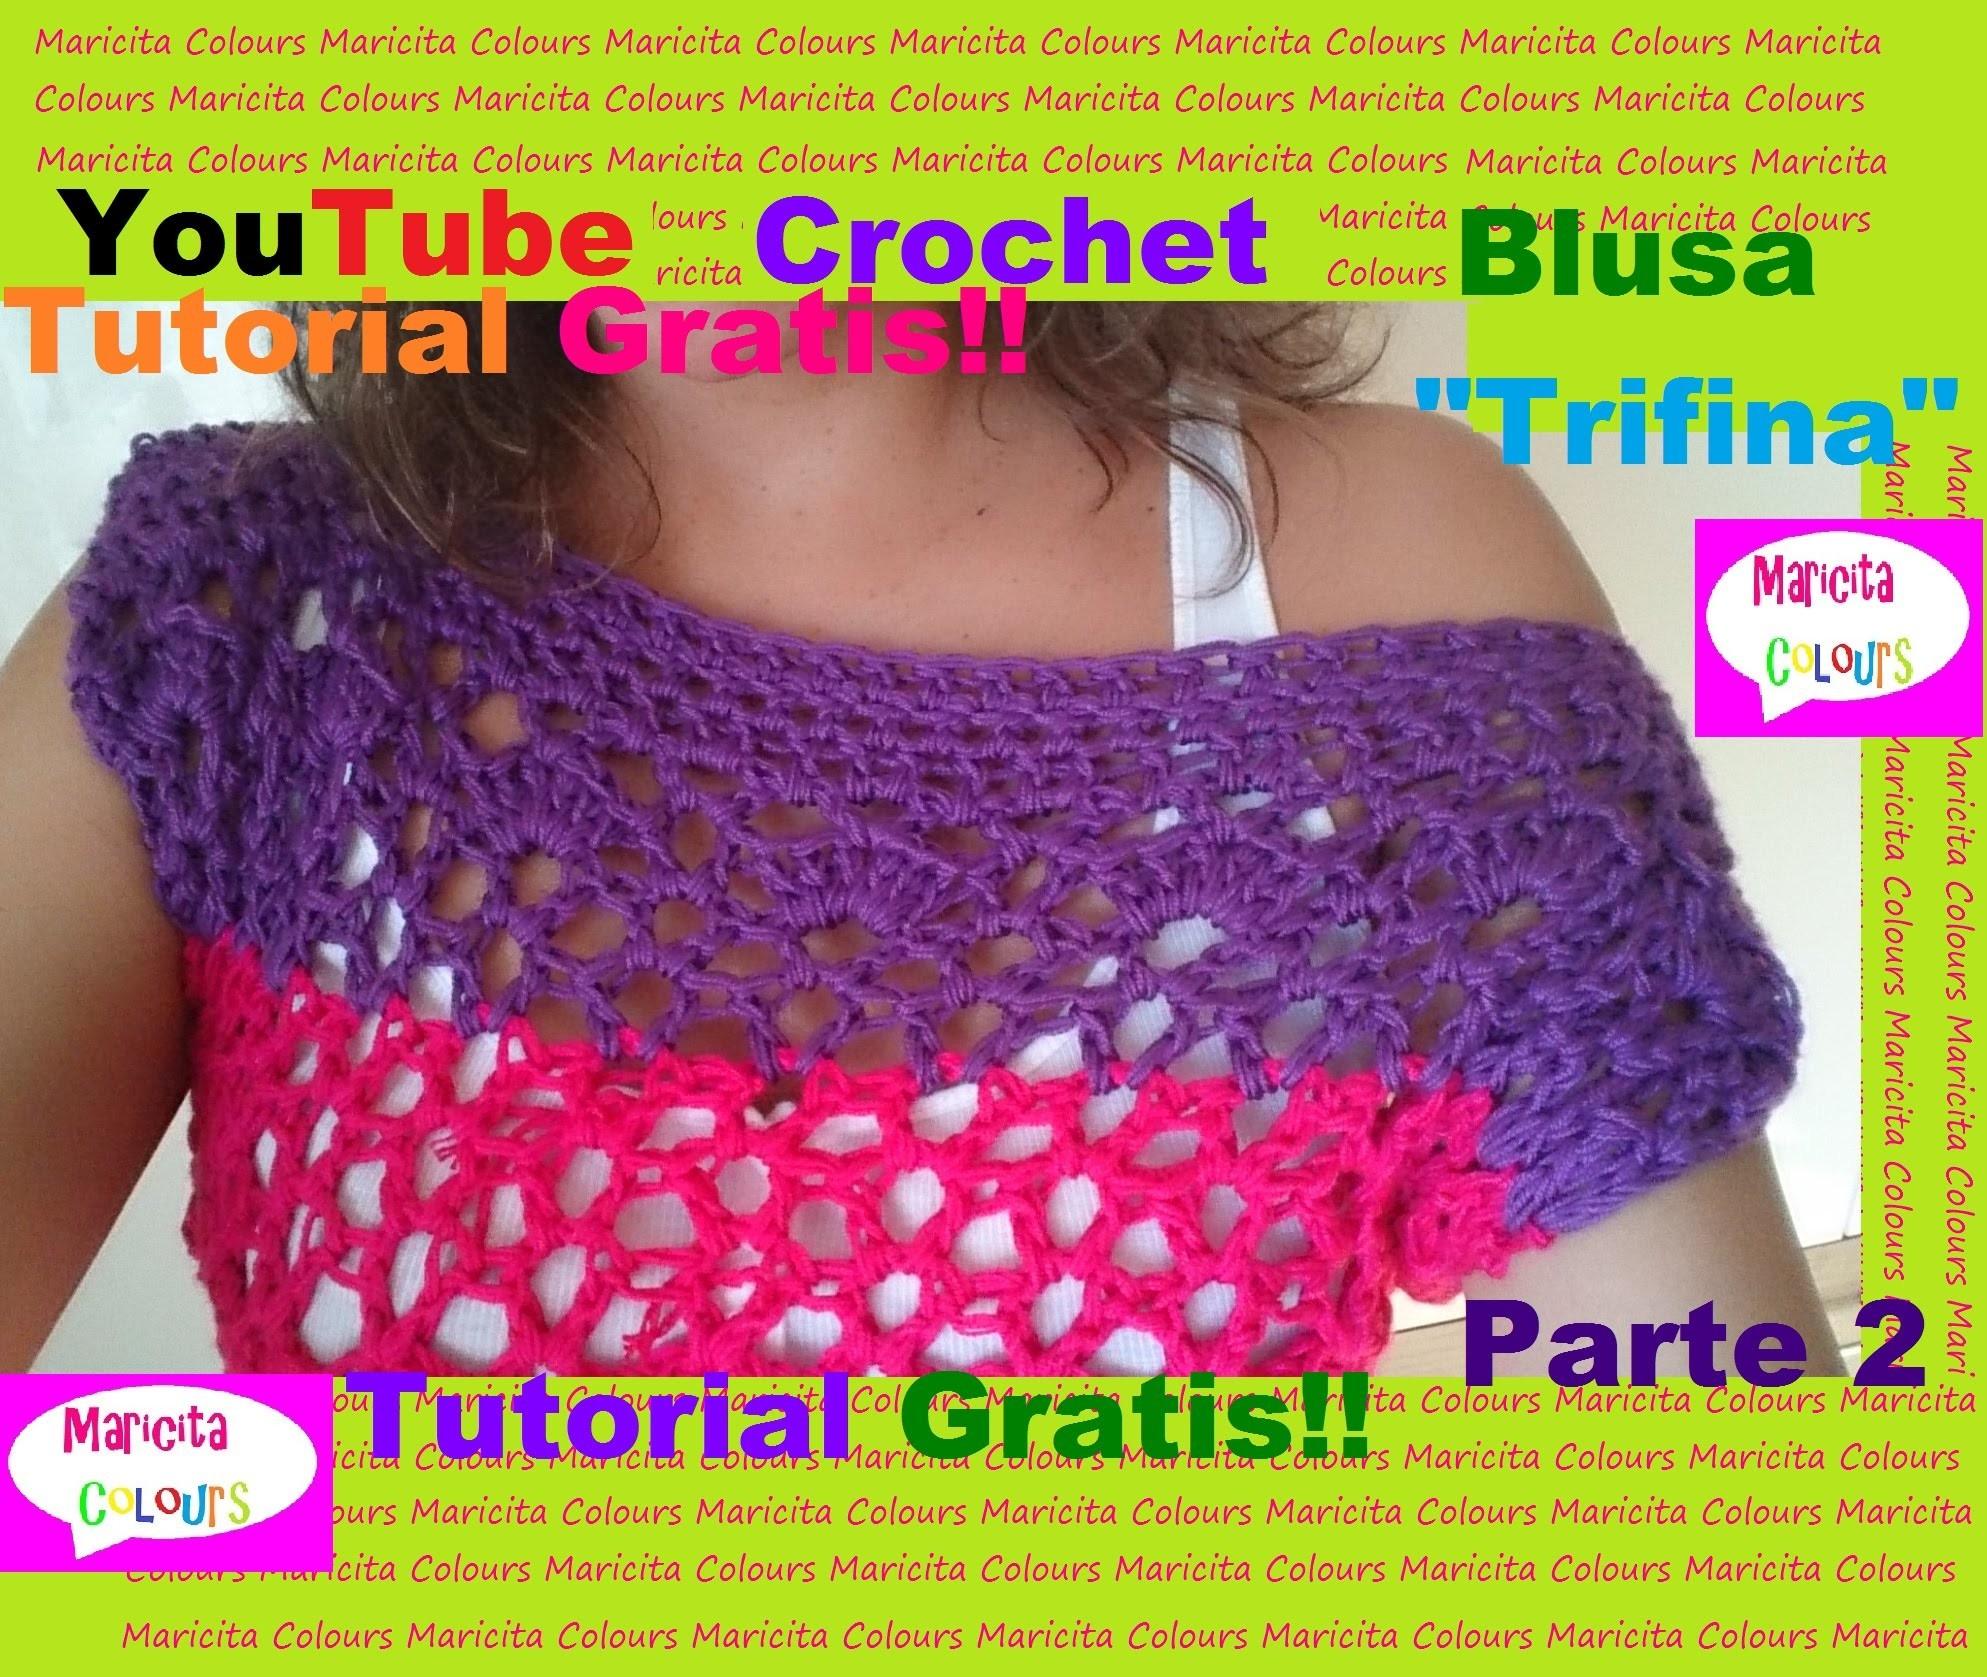 Crochet Bella Blusa